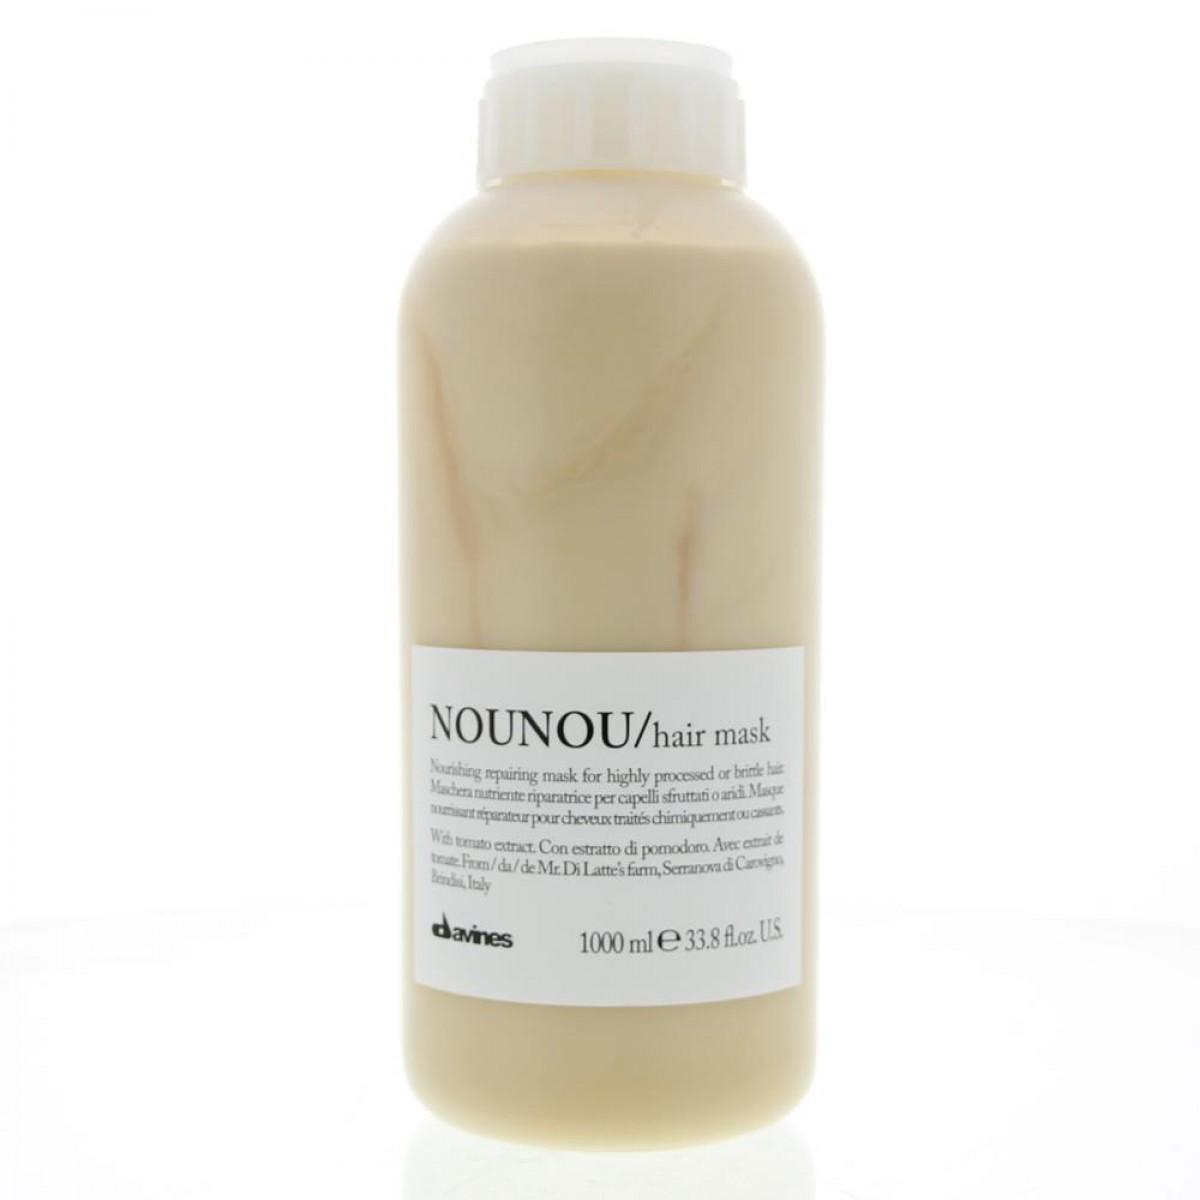 DAVINES NOUNOU/hair mask - Интенсивная восстанавливающая маска для глубокого питания волос 1000мл. 75009